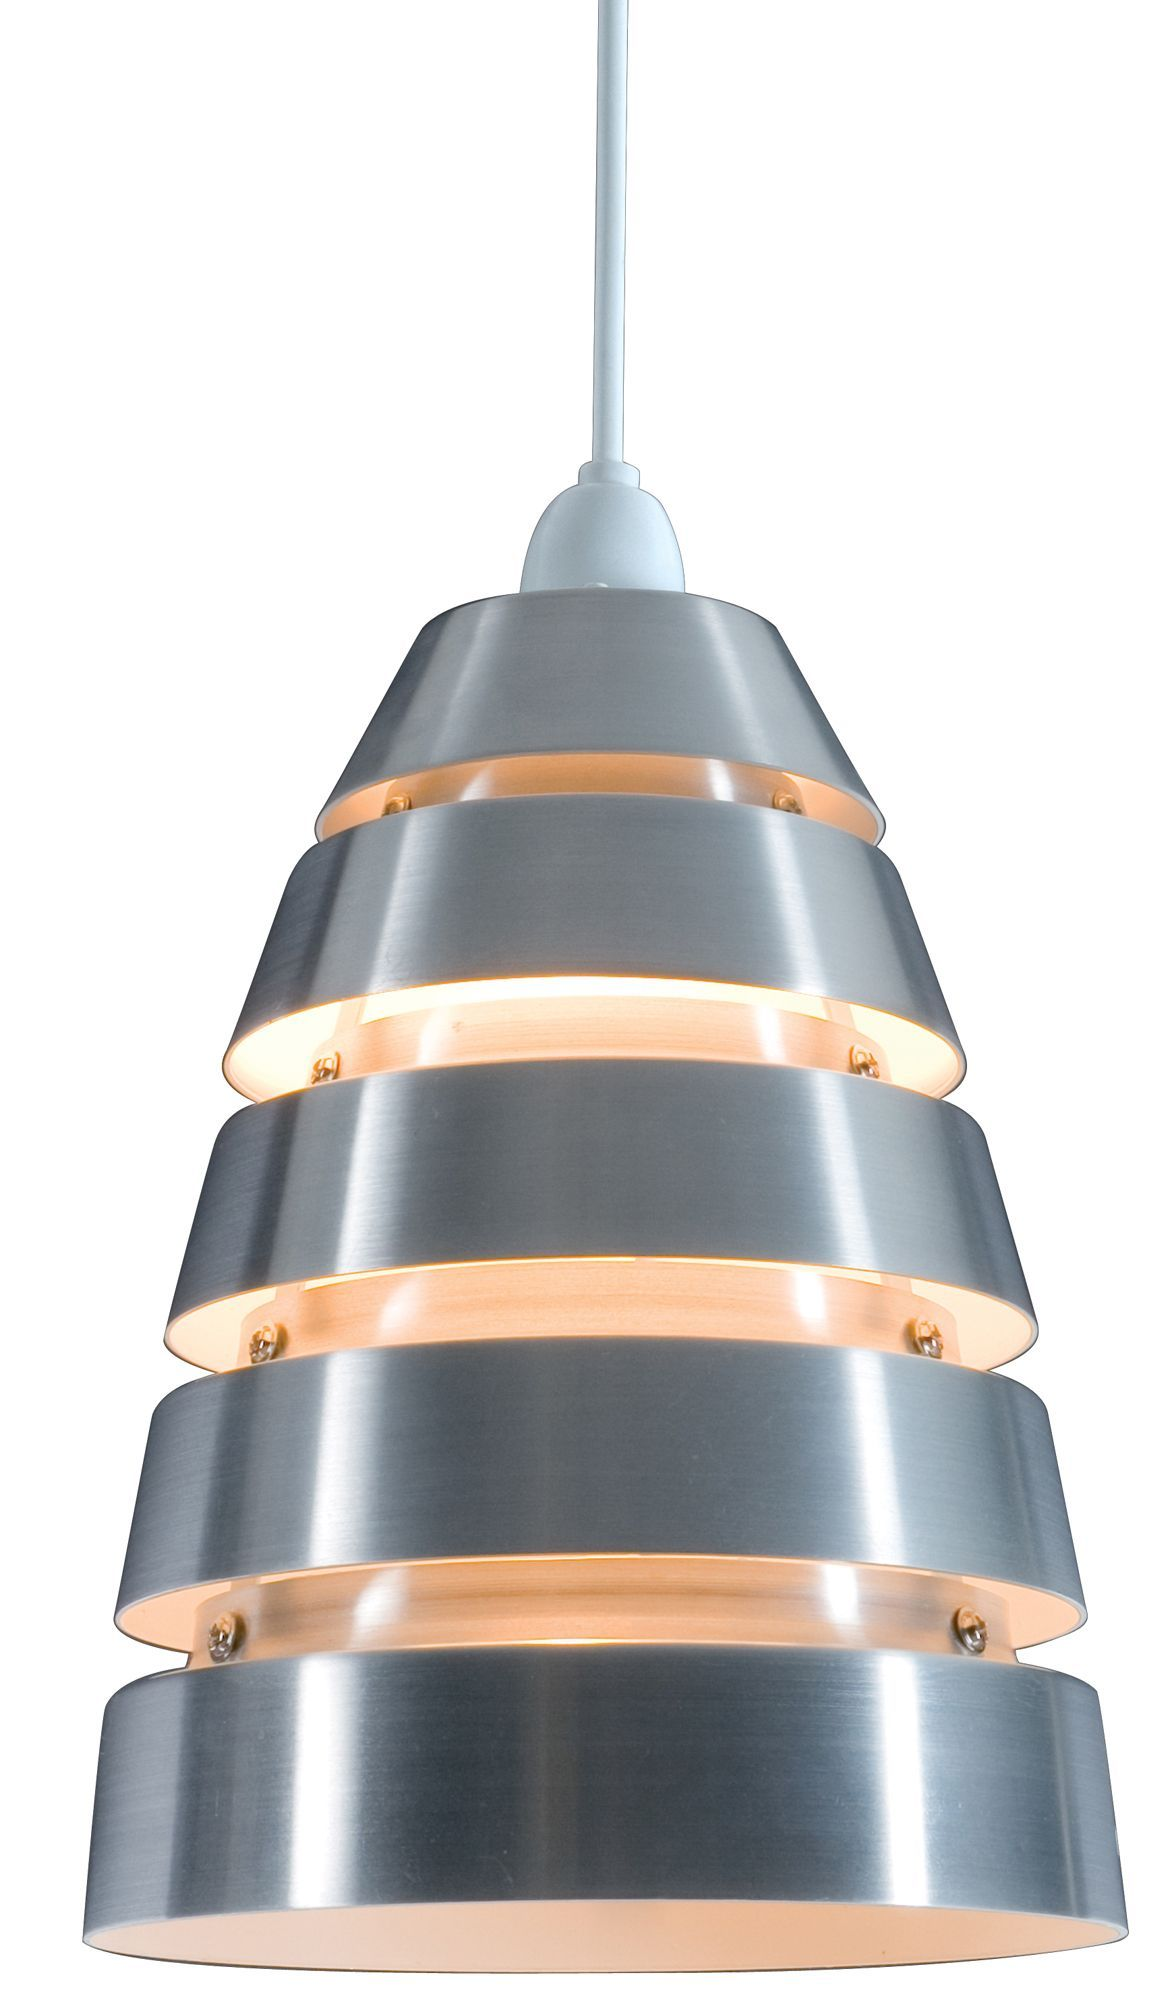 Large cut out dome metal lighting pendant shades cream - Colours Jet Cream Aluminium Cutaway Pendant Light Shade D 18cm